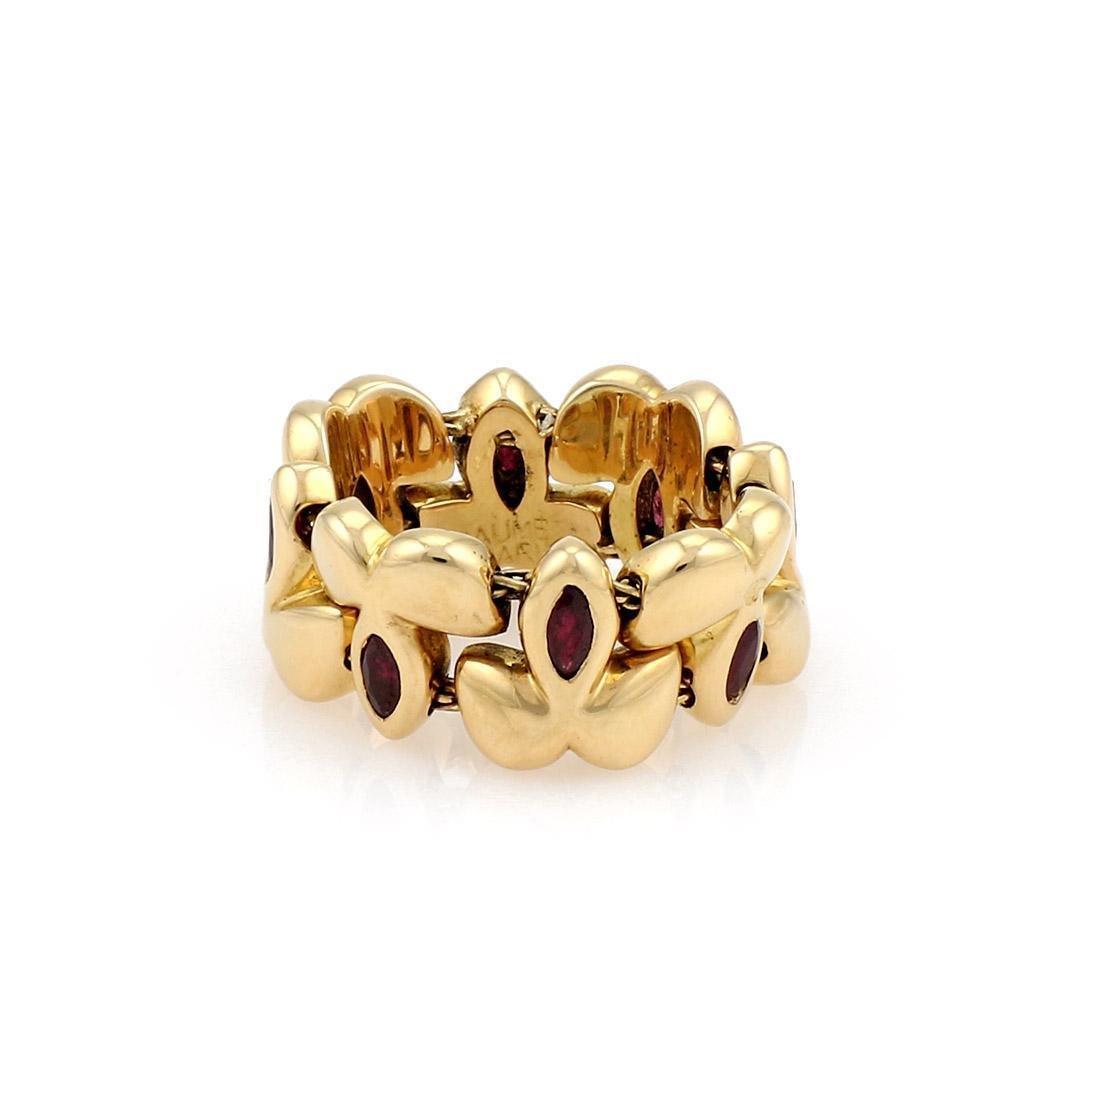 Chaumet Paris Yellow Gold Ruby Flex Ring